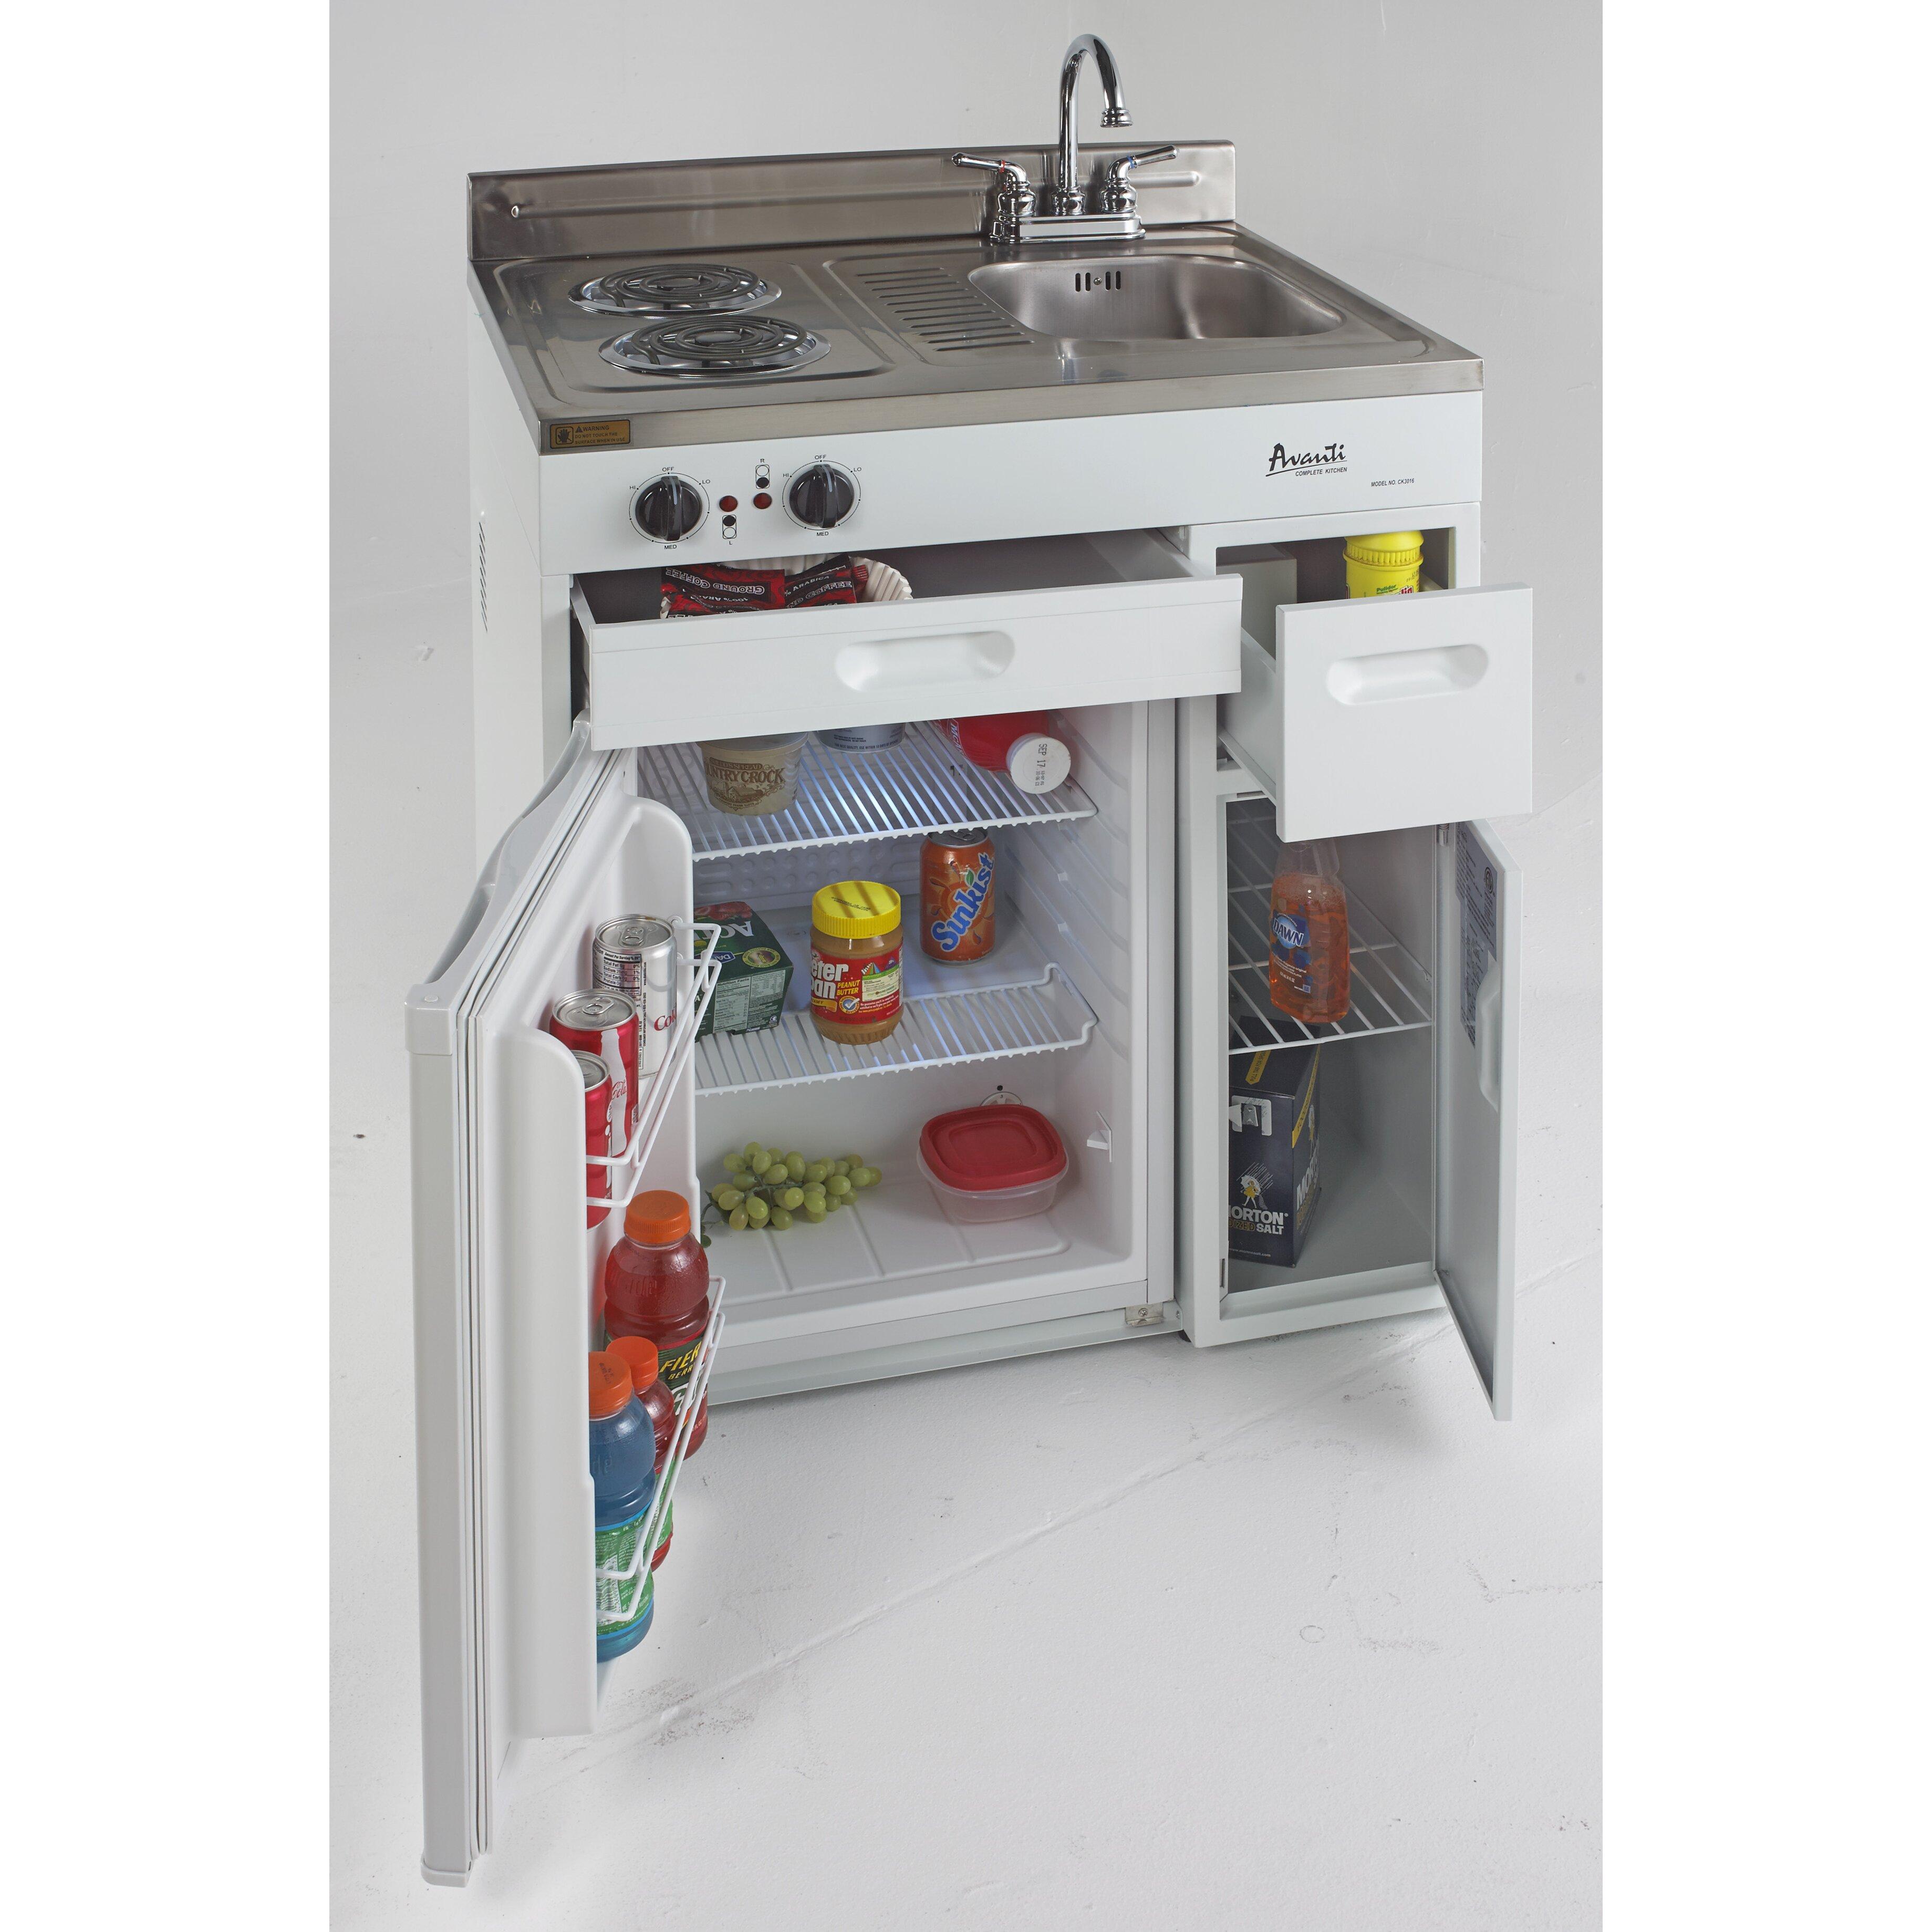 Avanti Mini Kitchen: Avanti 2.2 Cu. Ft. Compact Refrigerator With Complete